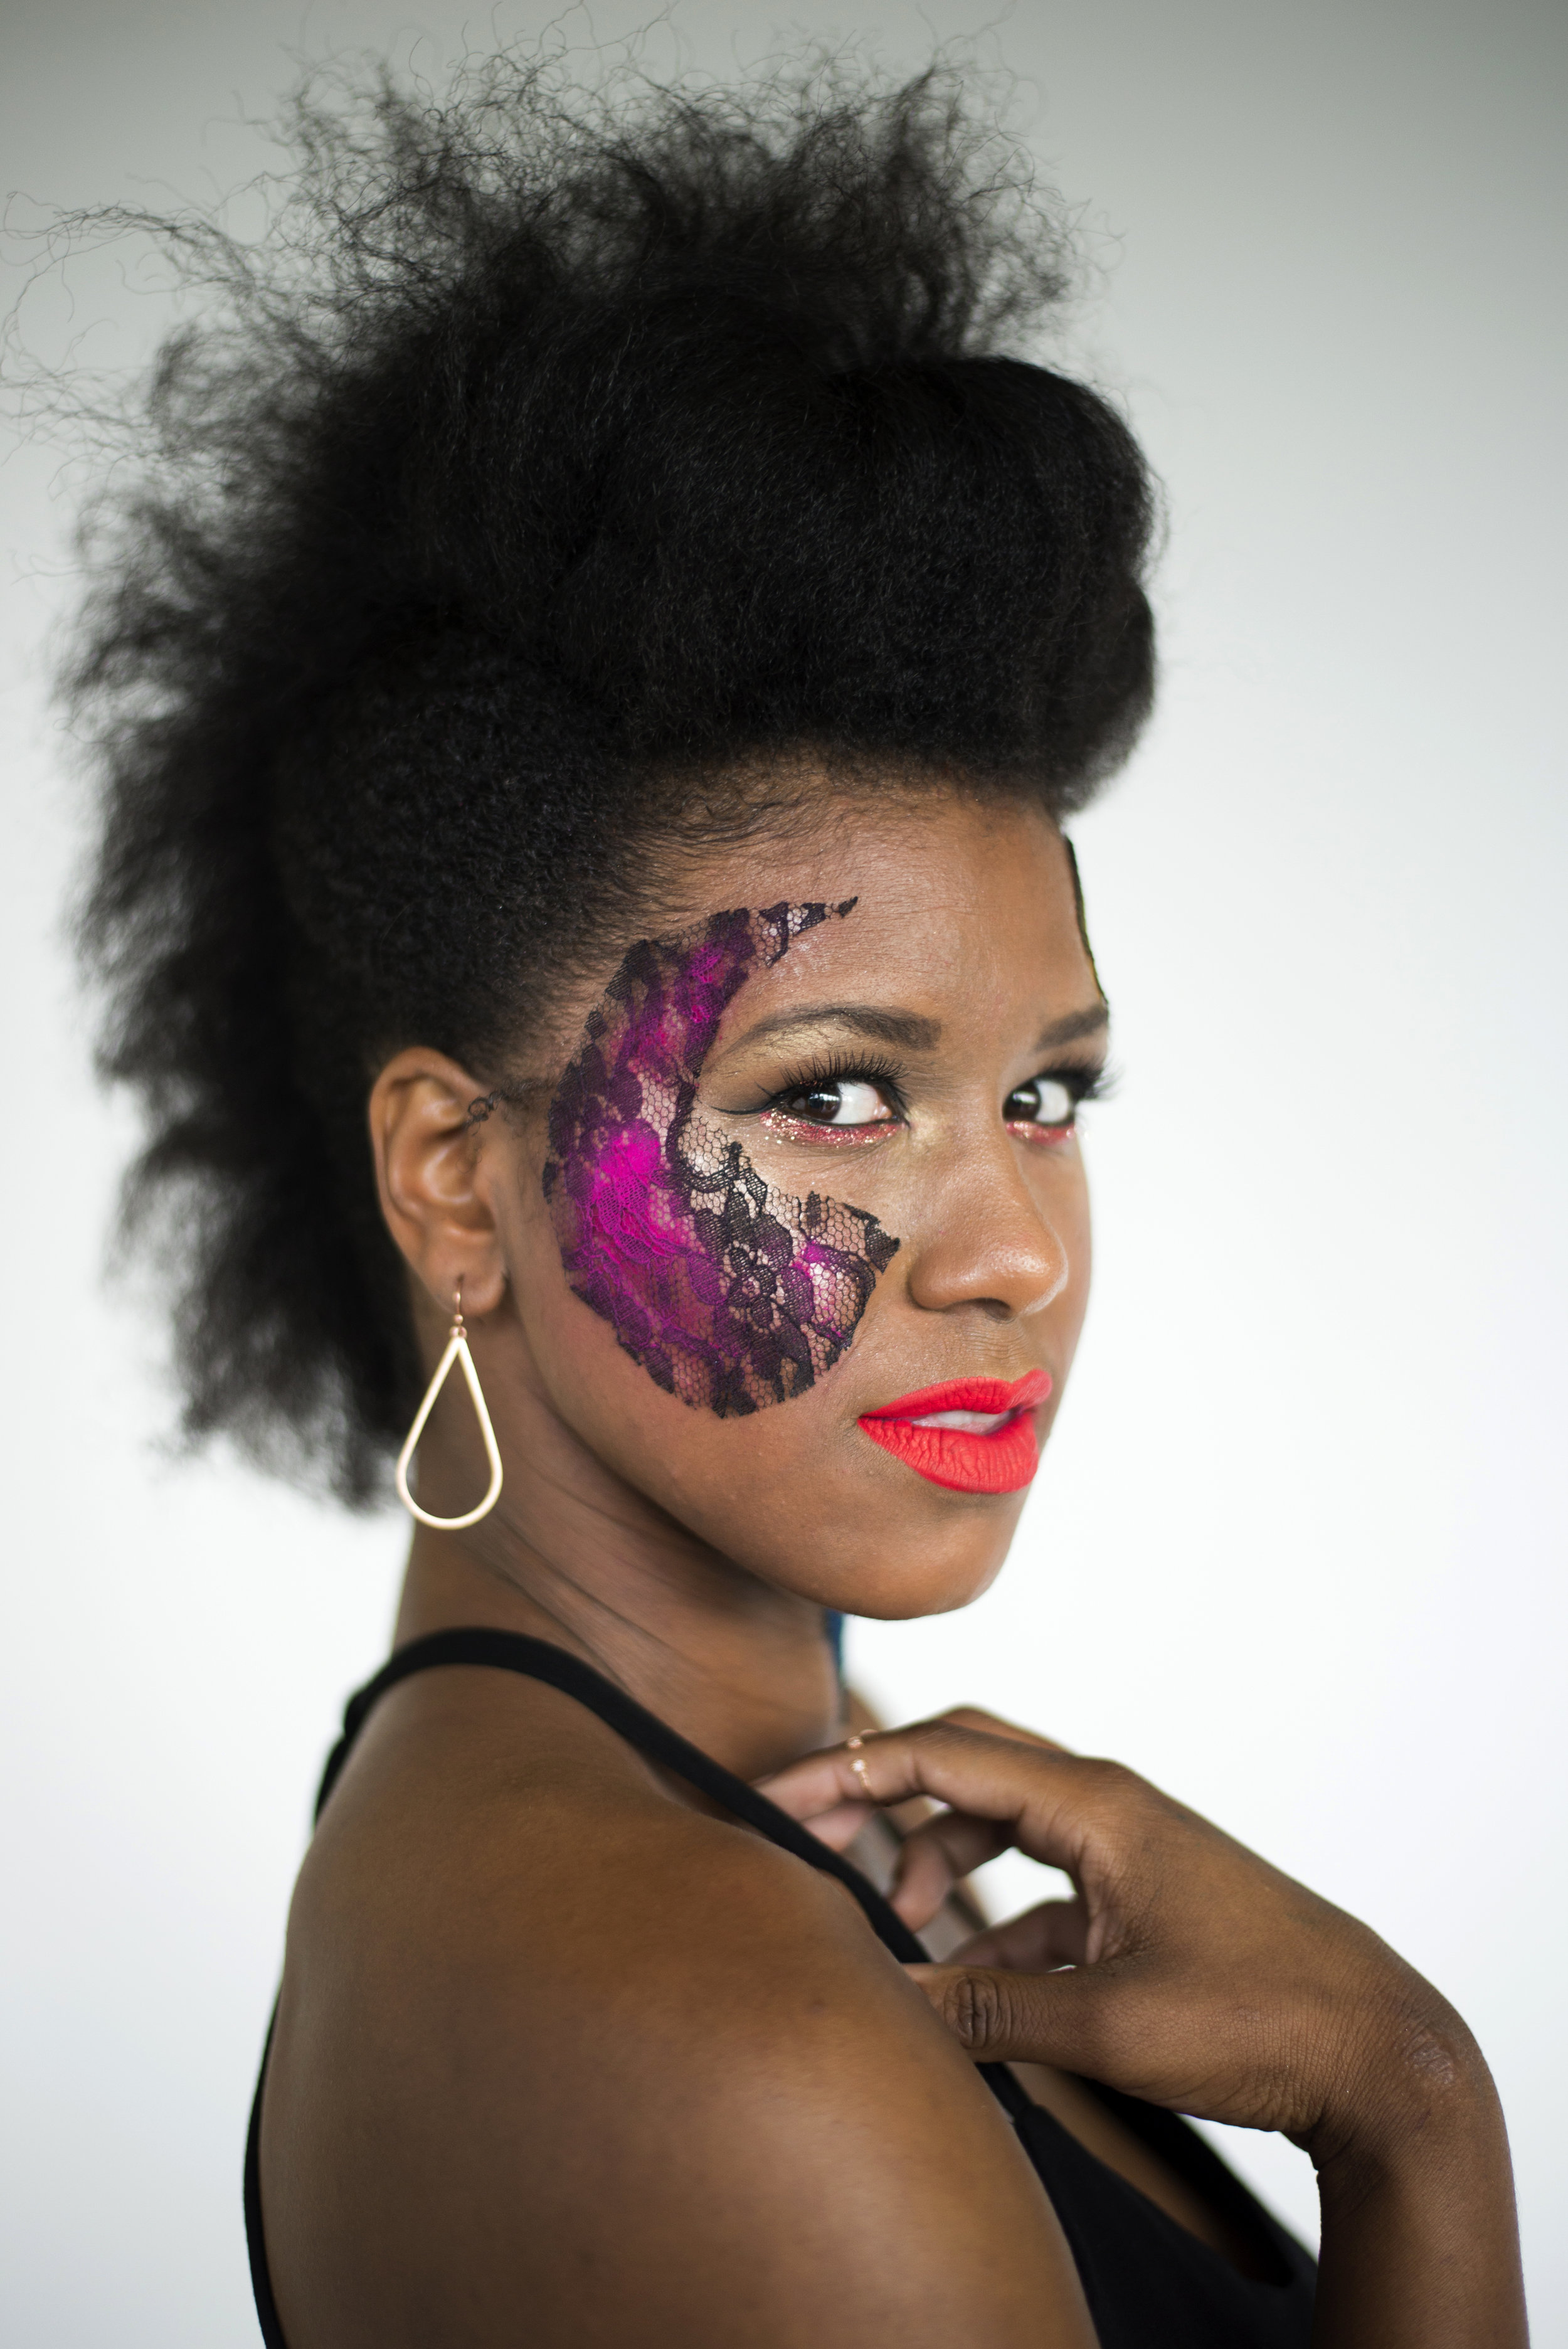 Makeup+Black Clothes_Allie Appel_57.jpg